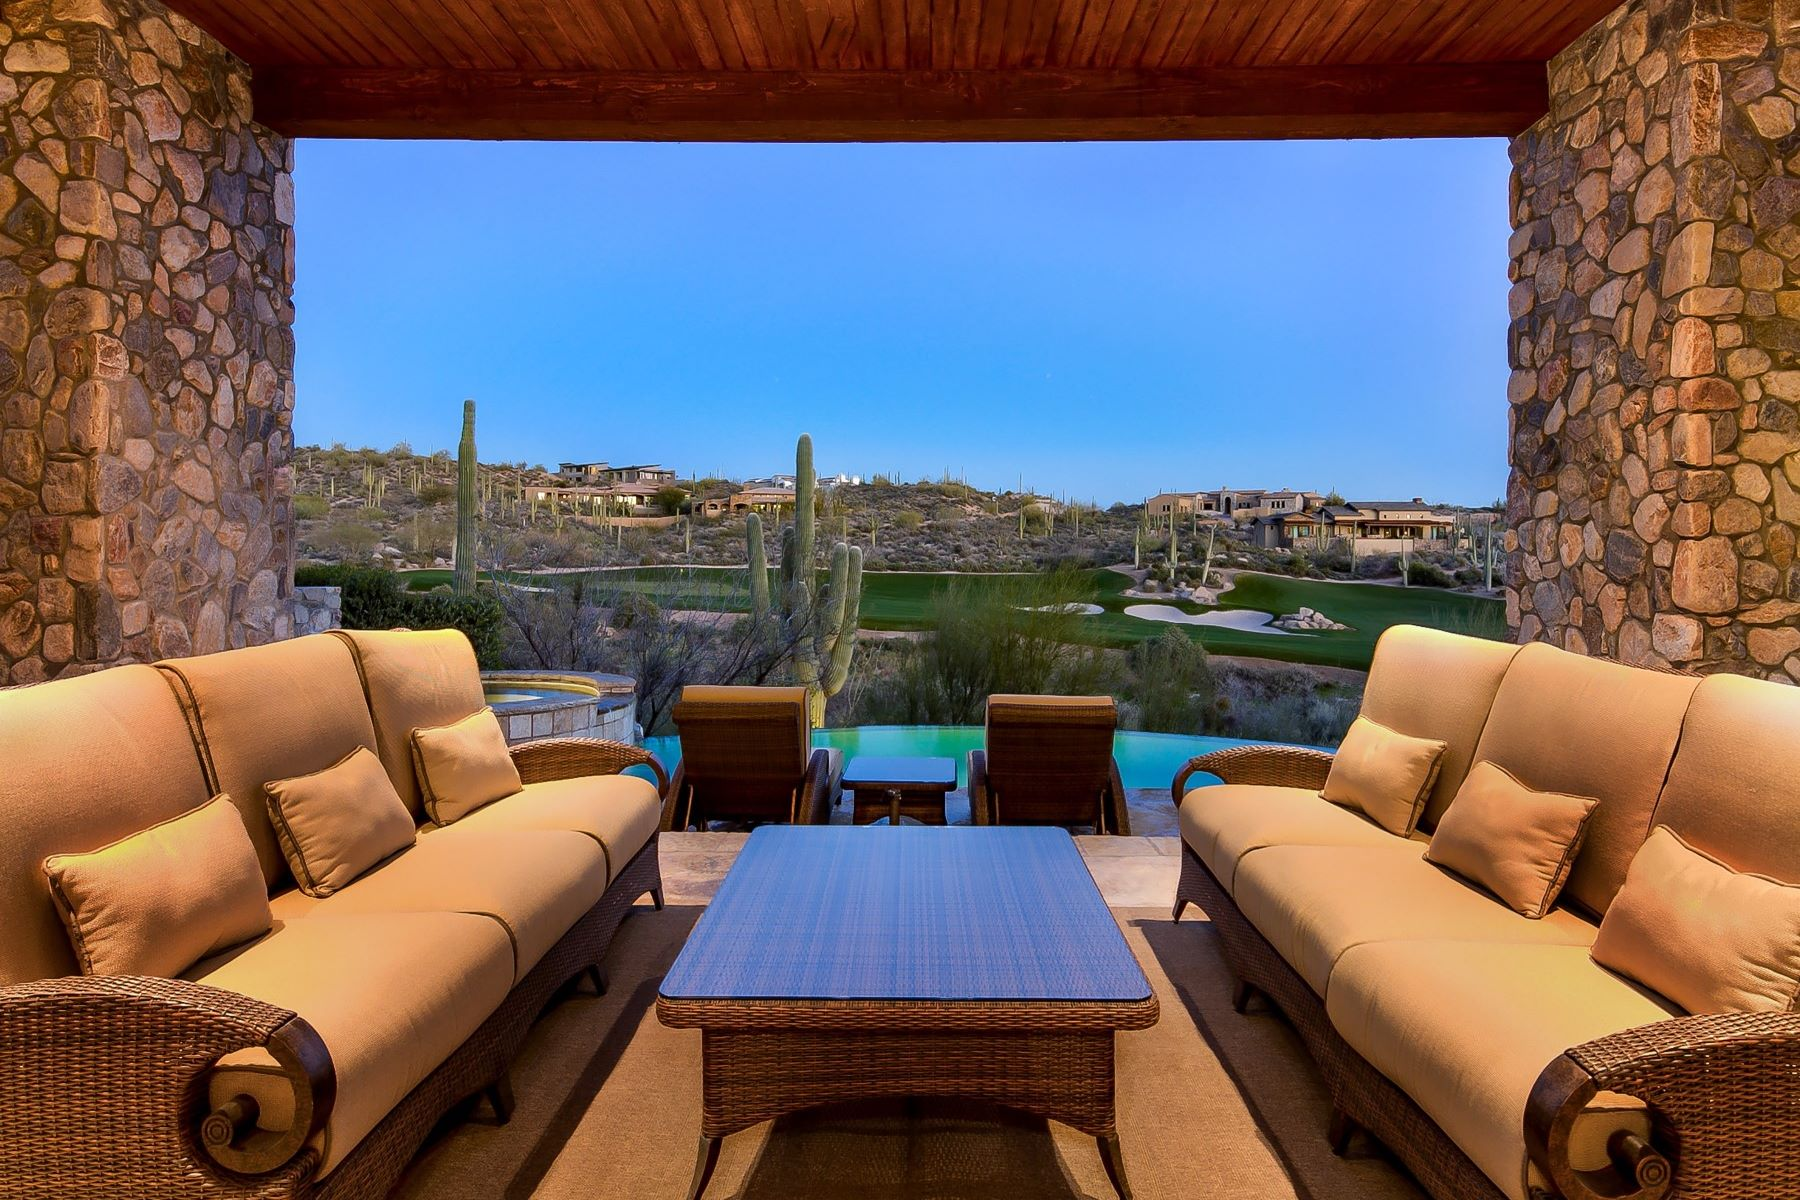 独户住宅 为 销售 在 Incredible Home with Breathtaking Views 41445 N 95TH ST, 斯科茨代尔, 亚利桑那州, 85262 美国